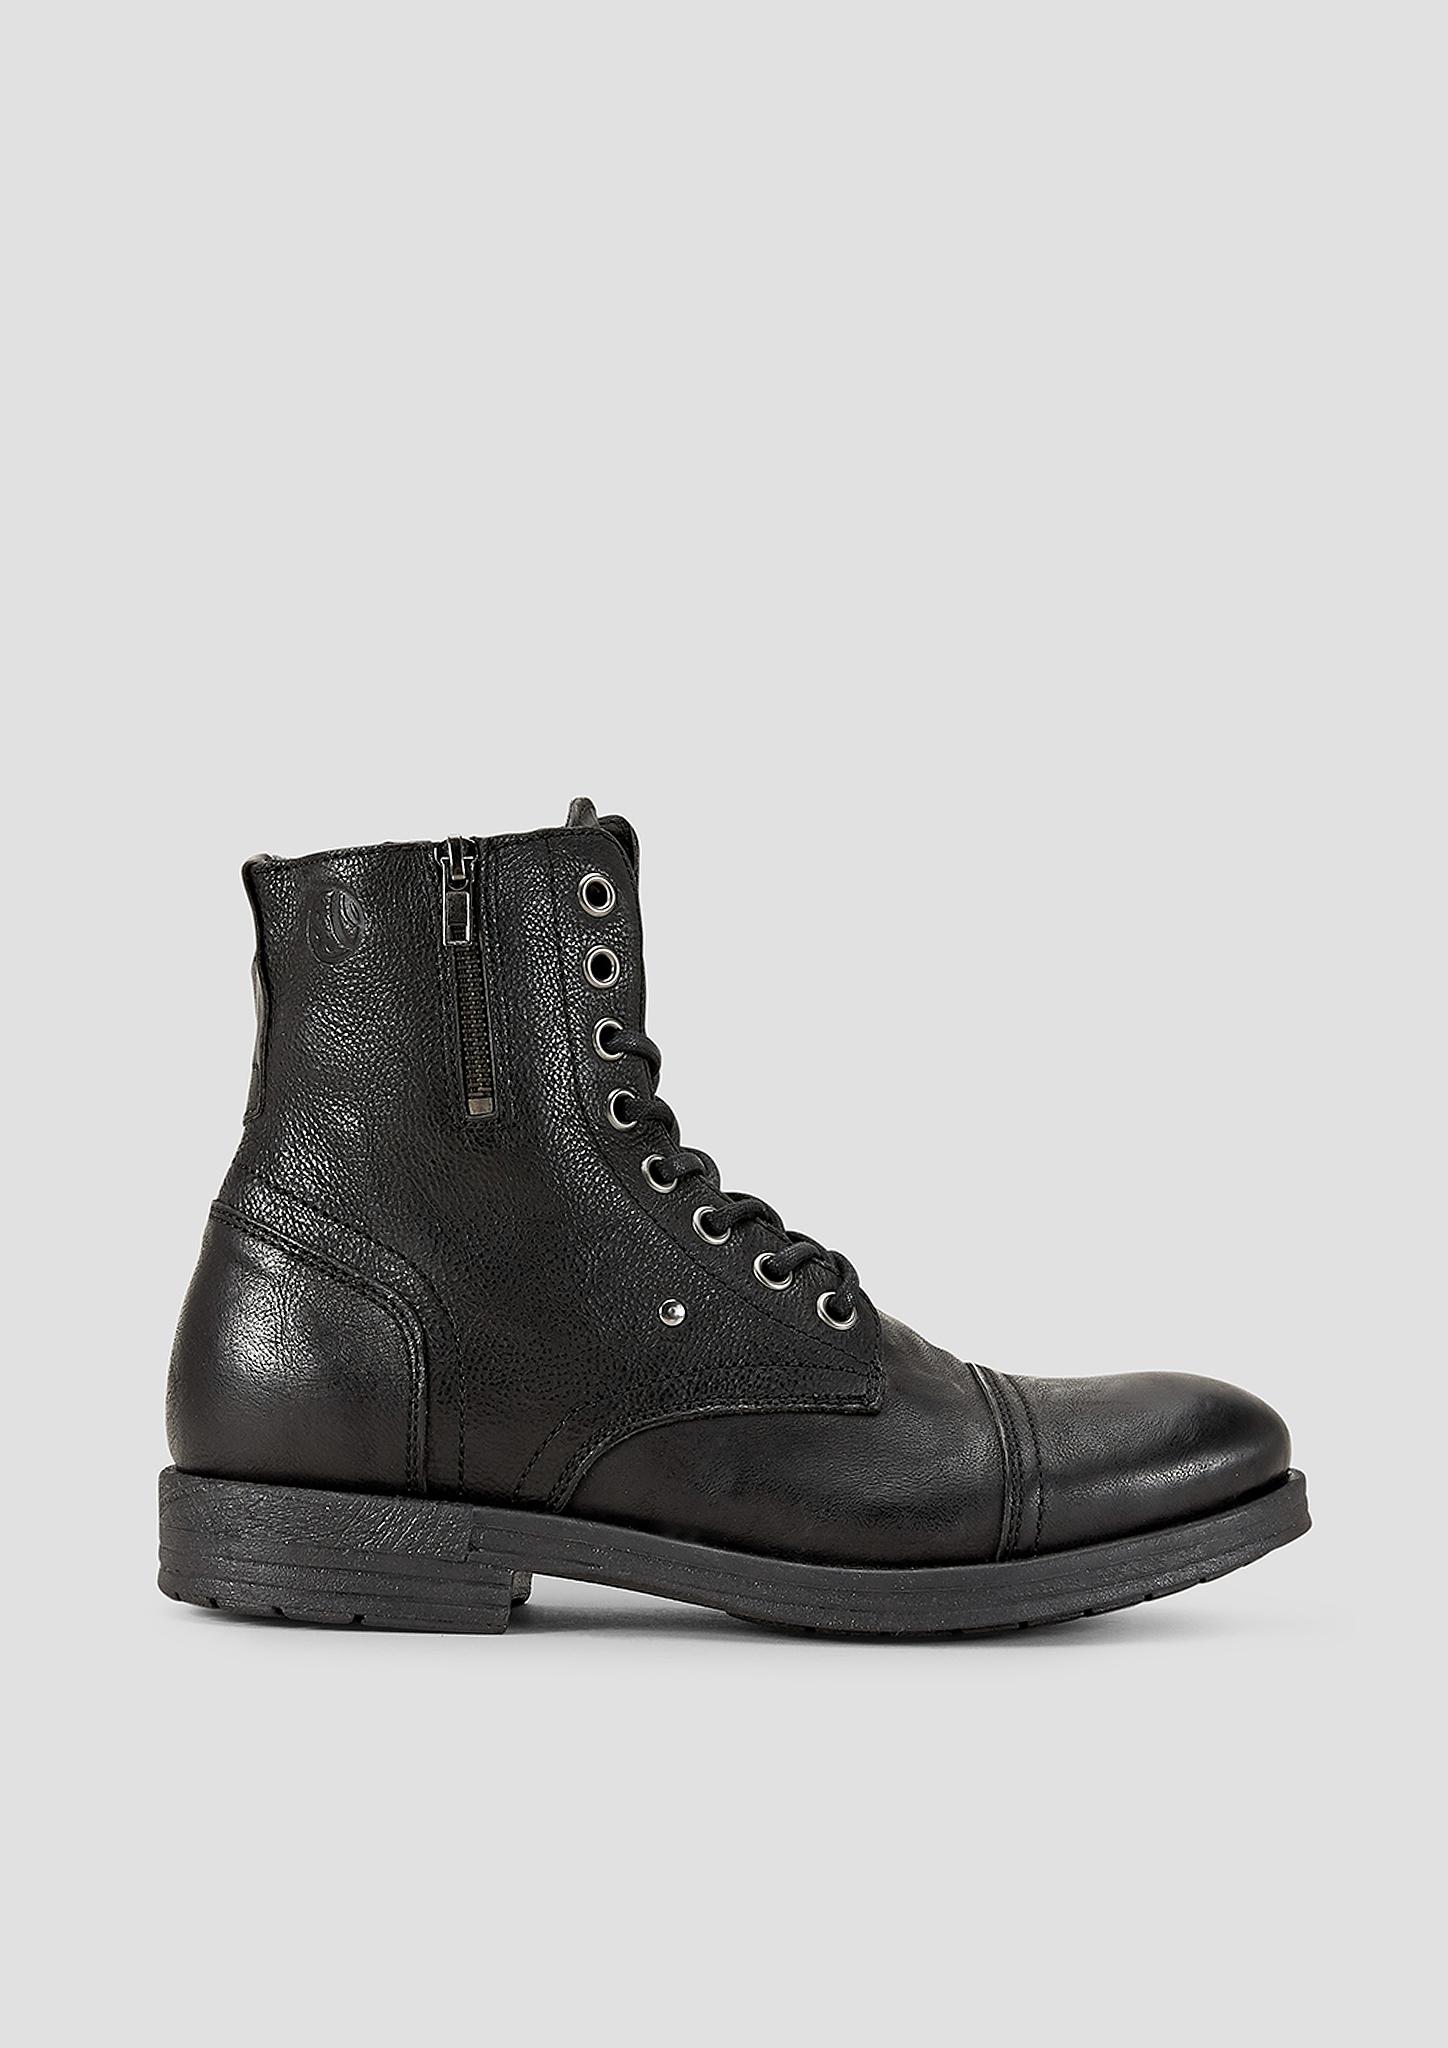 Lederboots | Schuhe > Boots > Boots | Grau/schwarz | Obermaterial aus echtleder| futter aus textil und synthetik| decksohle aus textil| laufsohle aus synthetik | s.Oliver